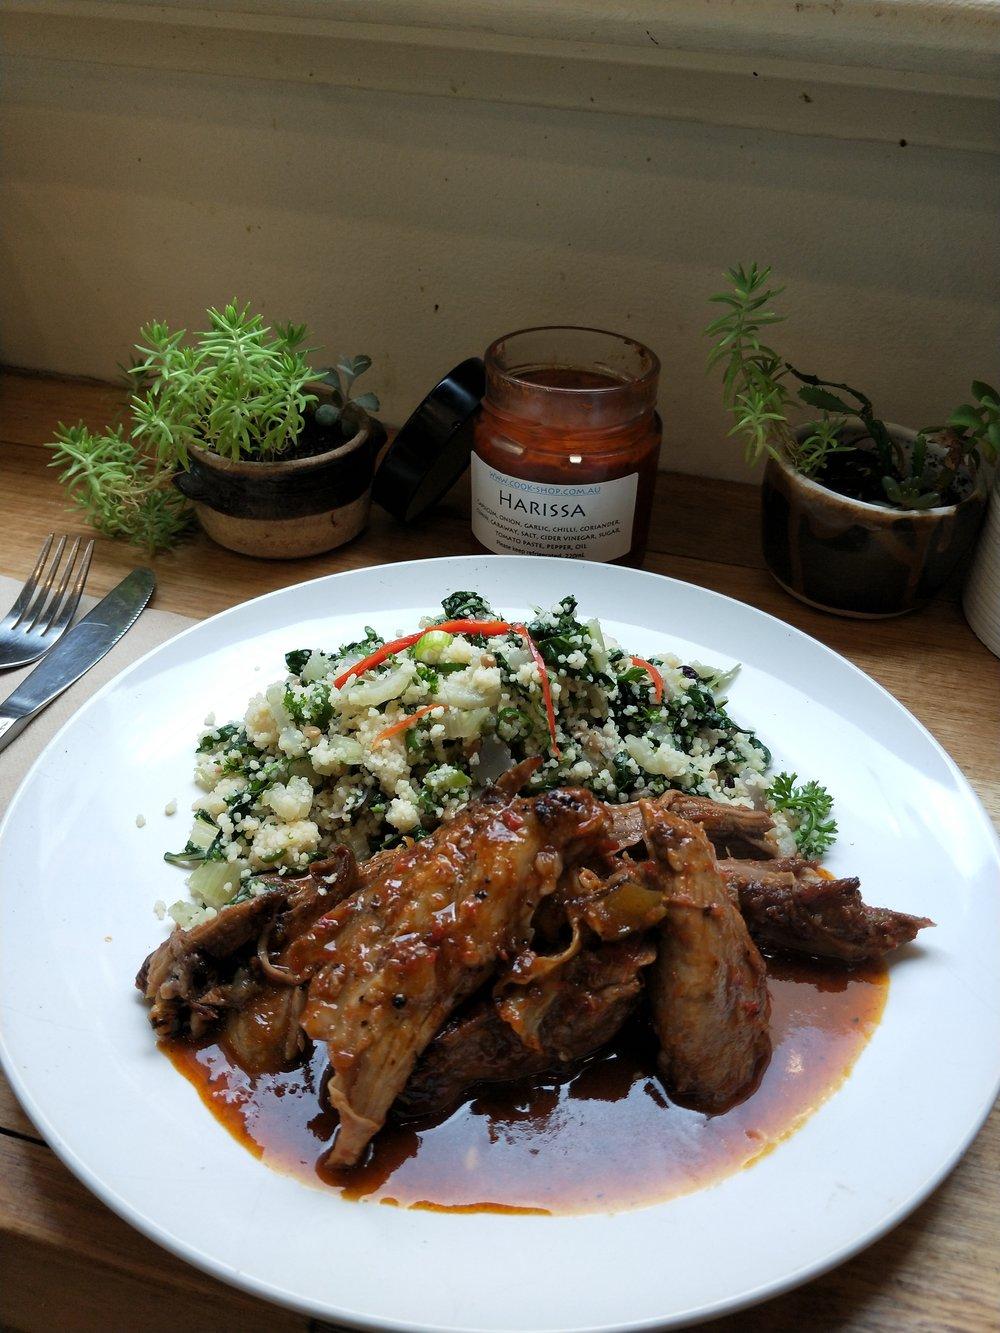 Meat Special Harissa Spiced Goat w/ Tabbouli